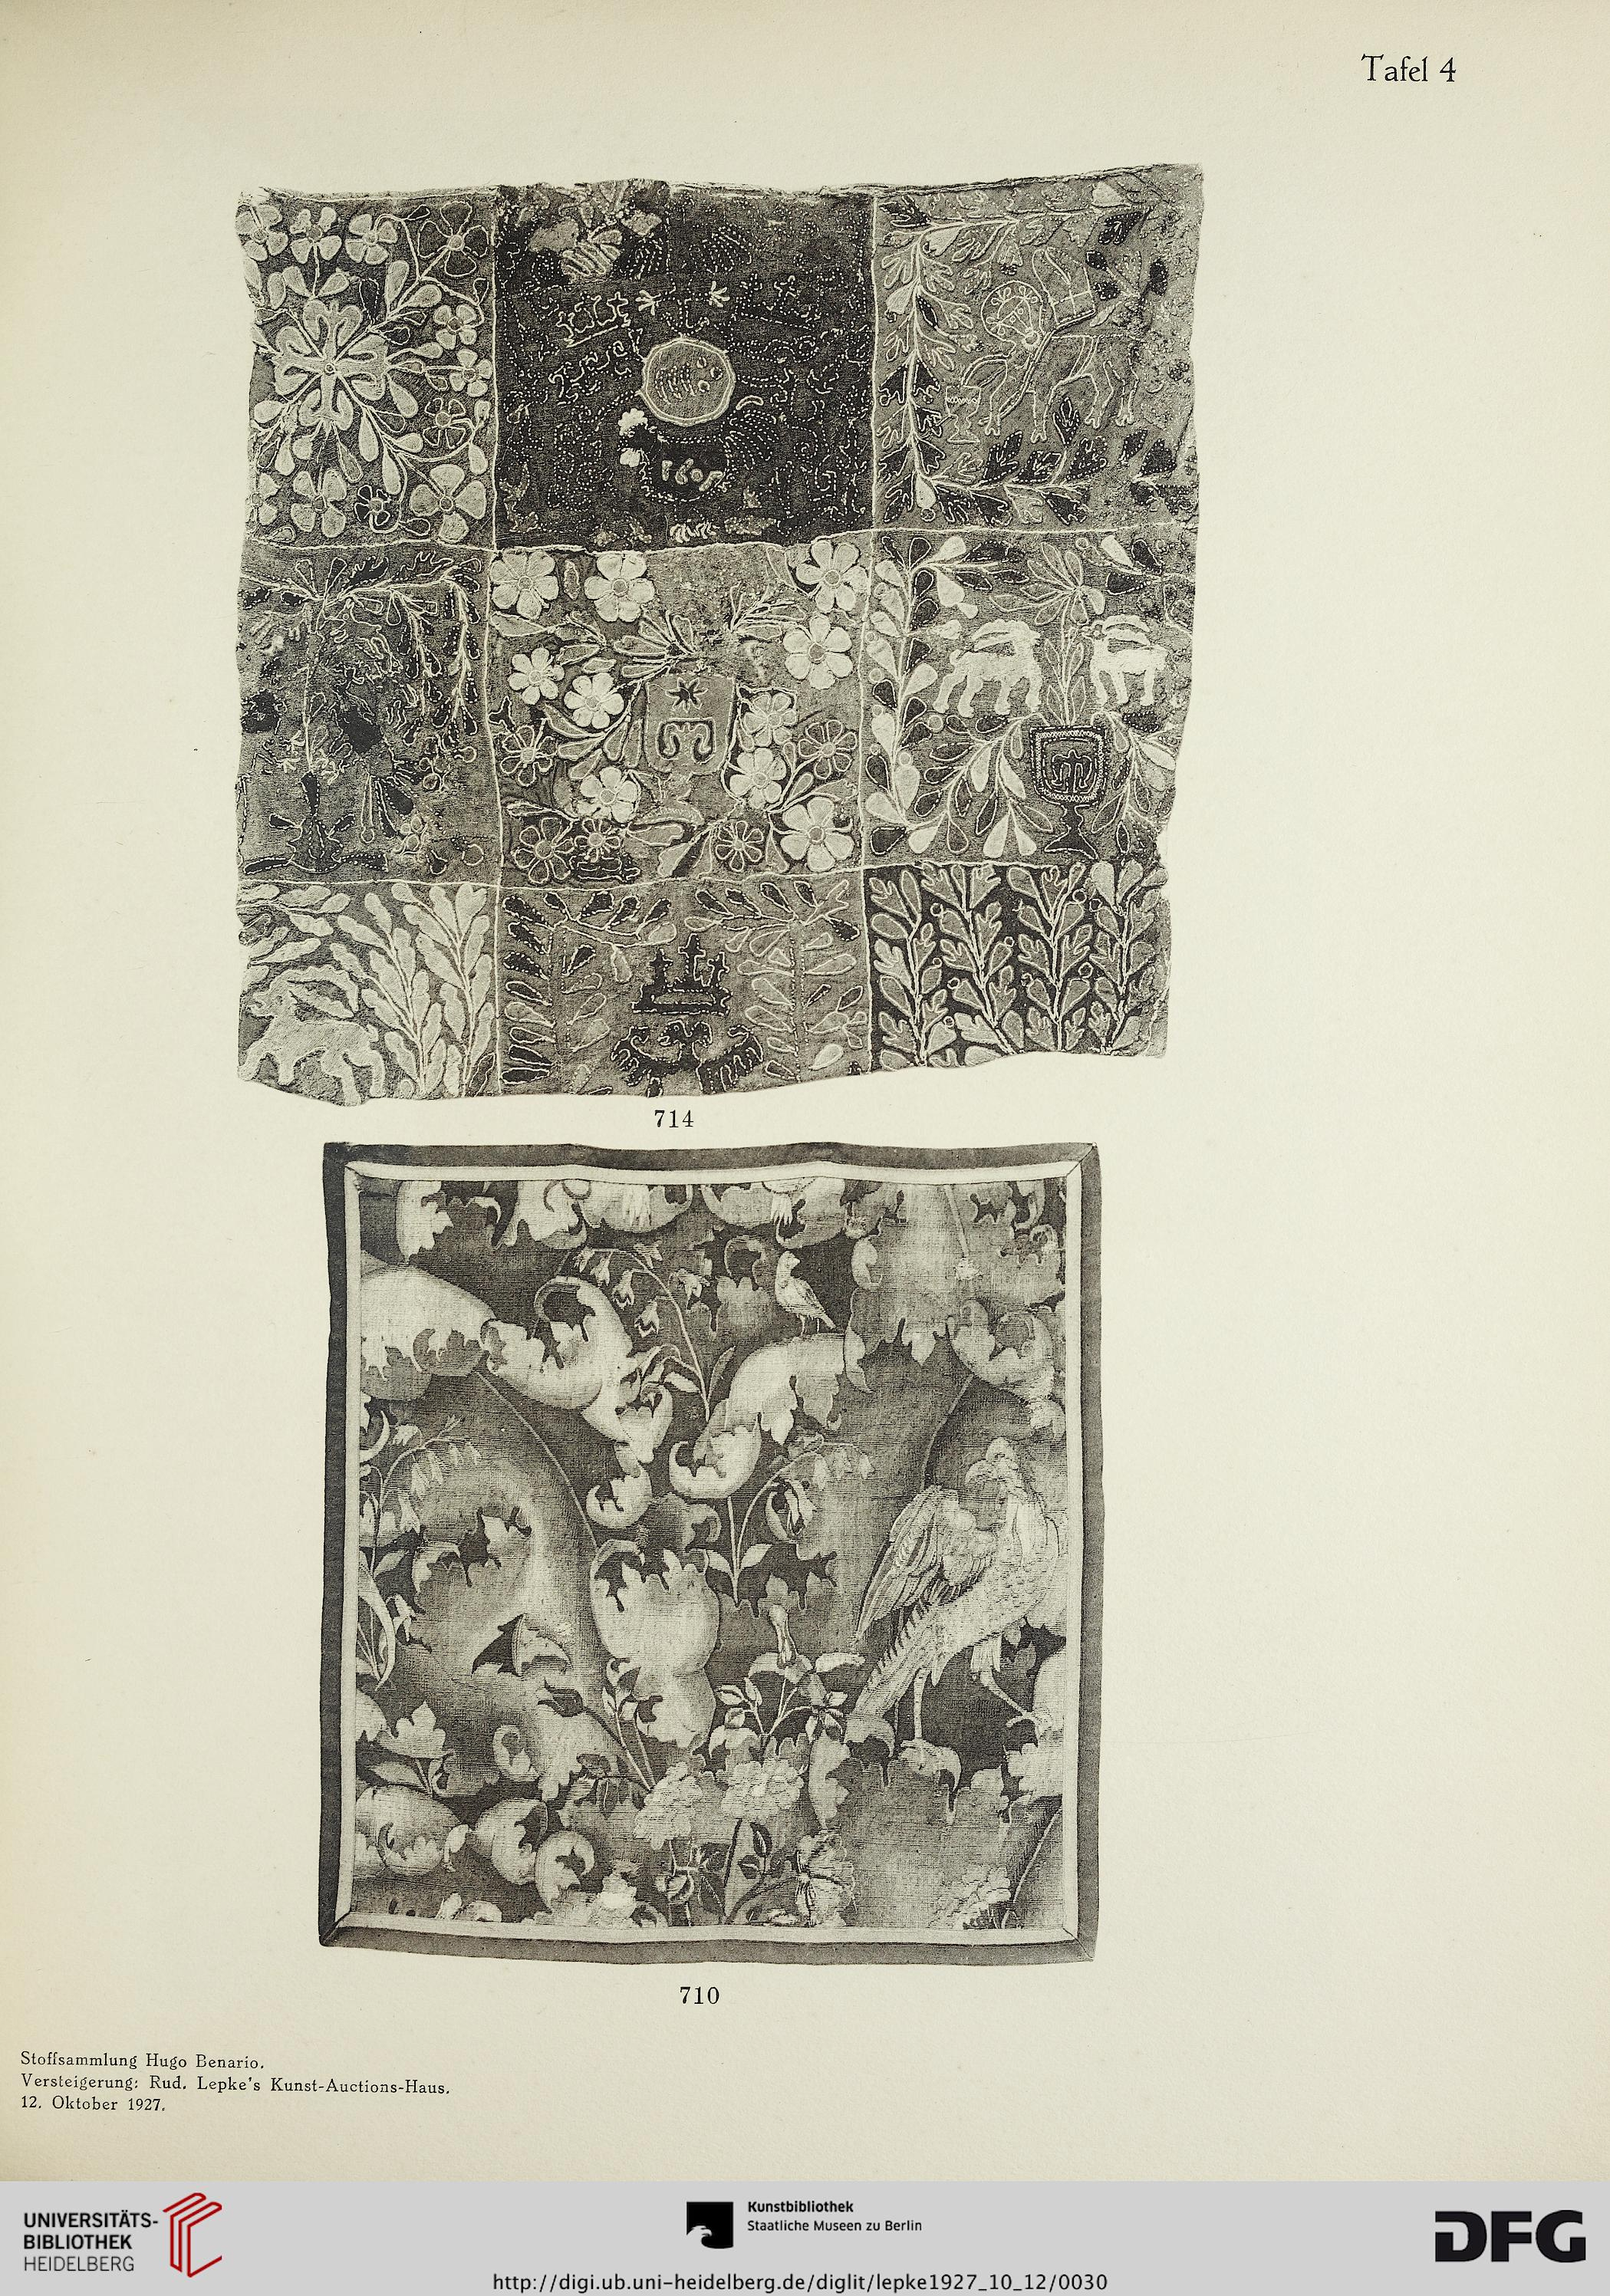 rudolph lepke 39 s kunst auctions haus hrsg stoffsammlung hugo benario berlin gyptische. Black Bedroom Furniture Sets. Home Design Ideas